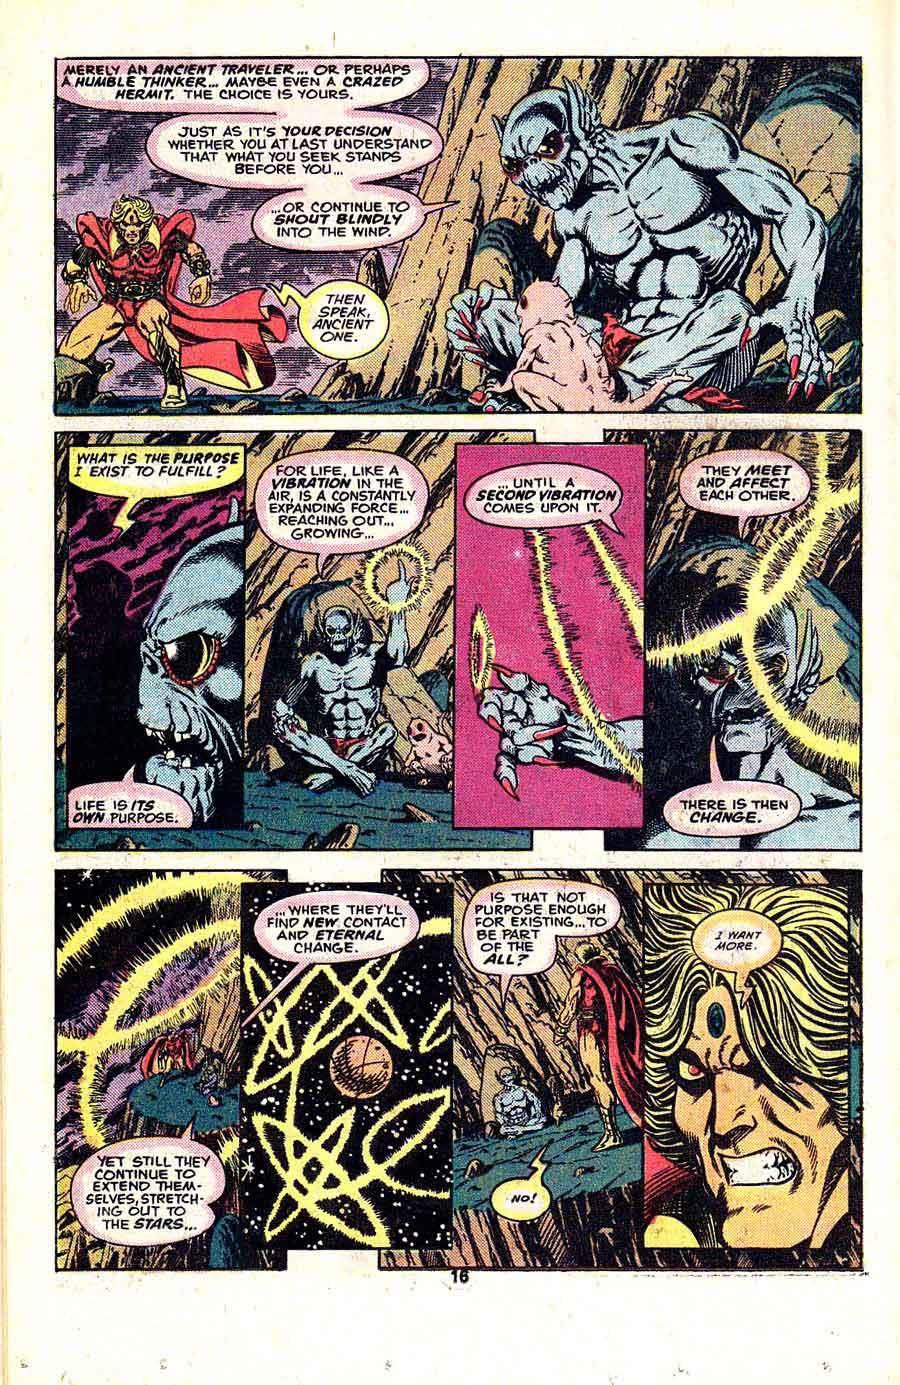 Warlock v1 #15 marvel 1970s bronze age comic book page art by Jim Starlin